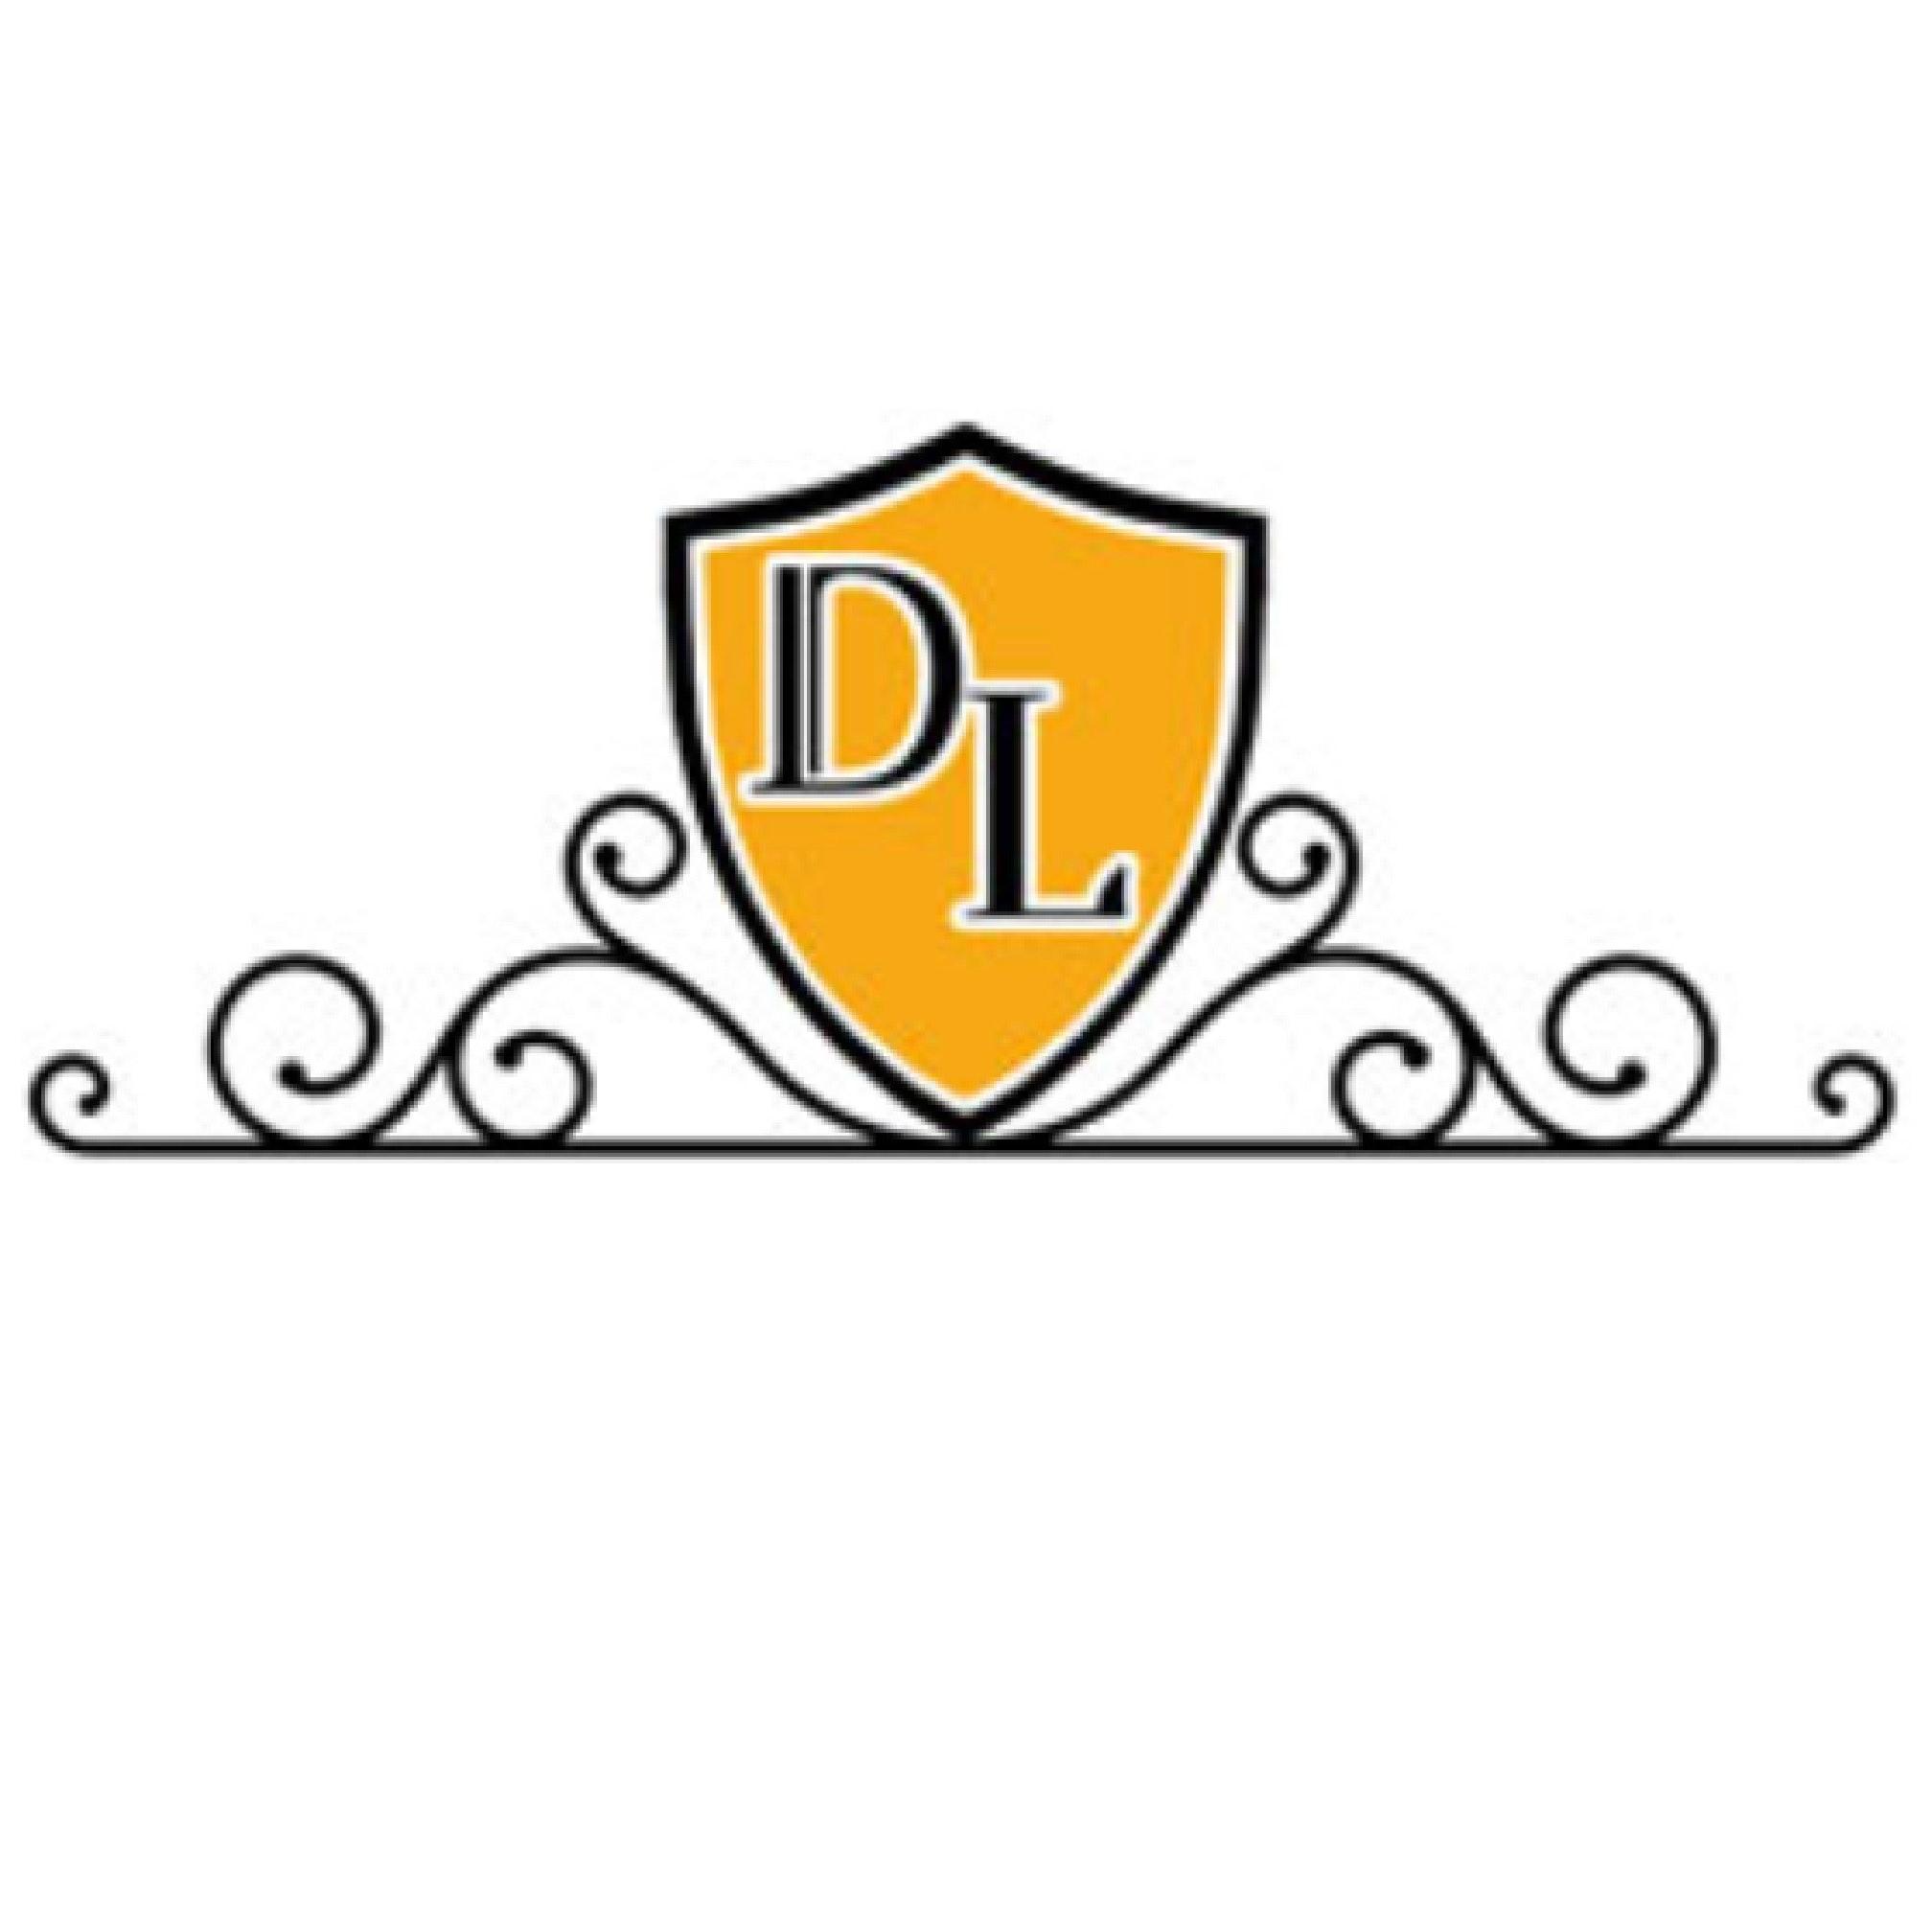 Delaware Limo logo